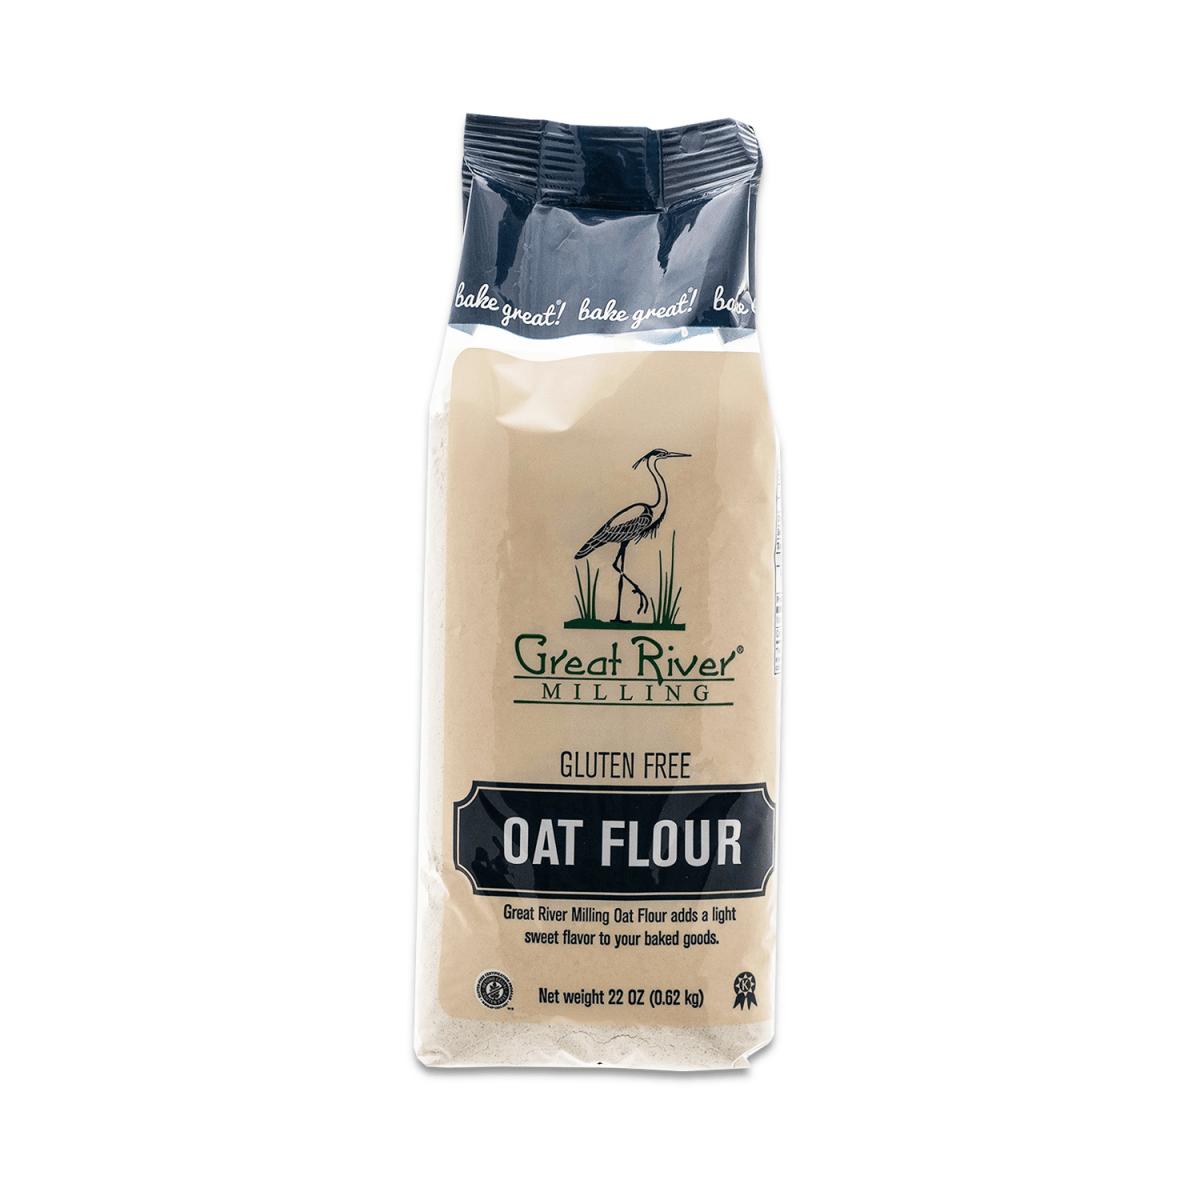 Great River Milling, GF, Oat Flour